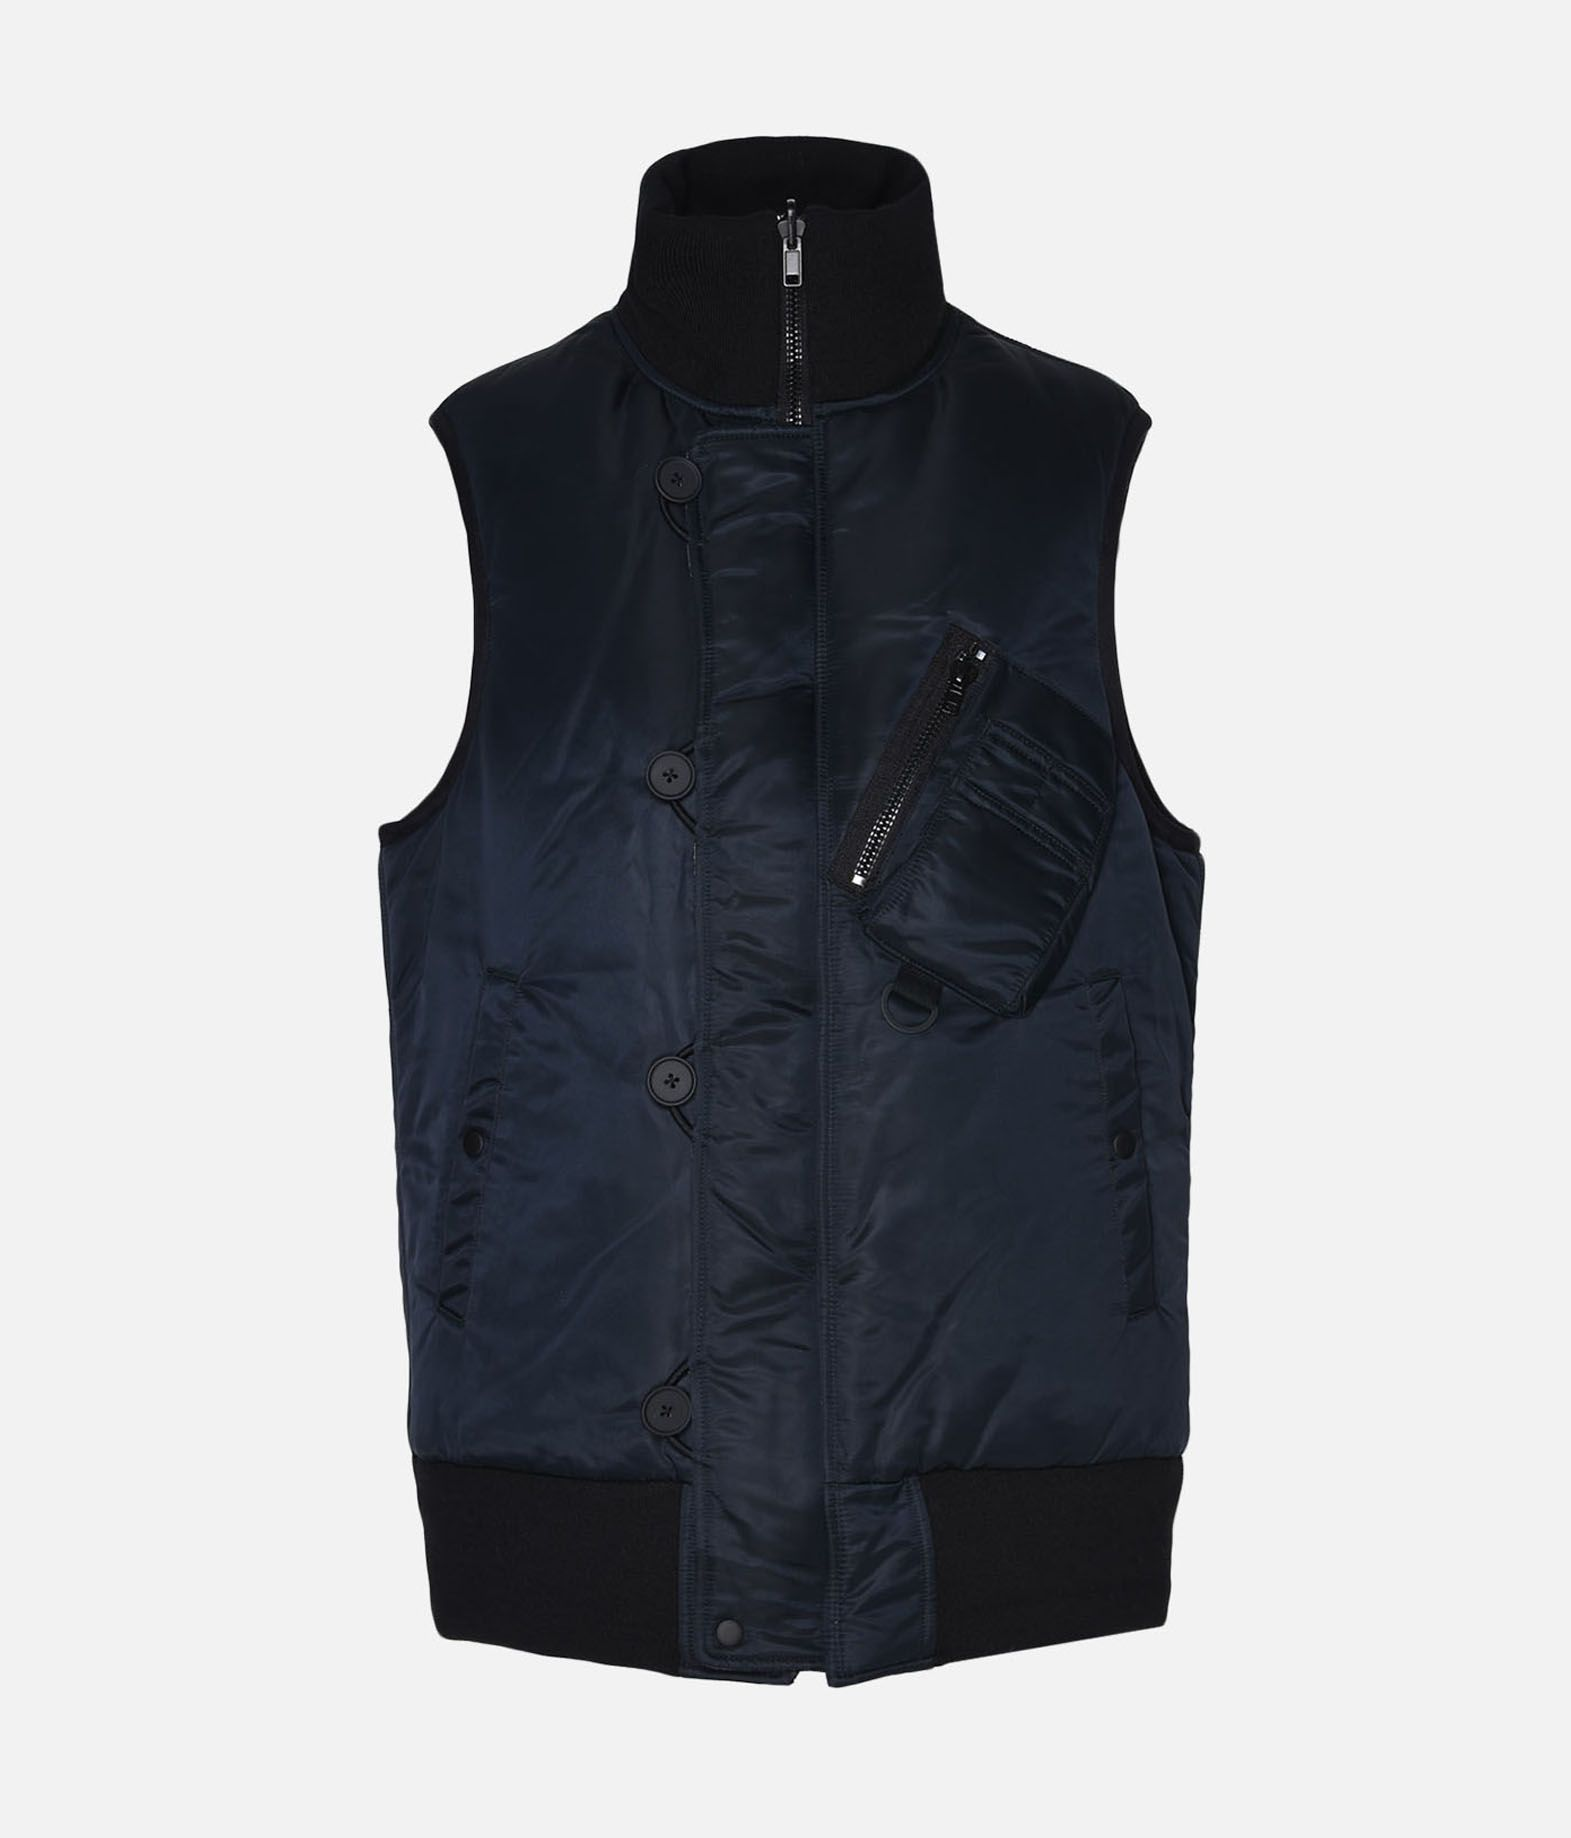 Y-3 Y-3 Oversize Reversible Vest Vest Man f